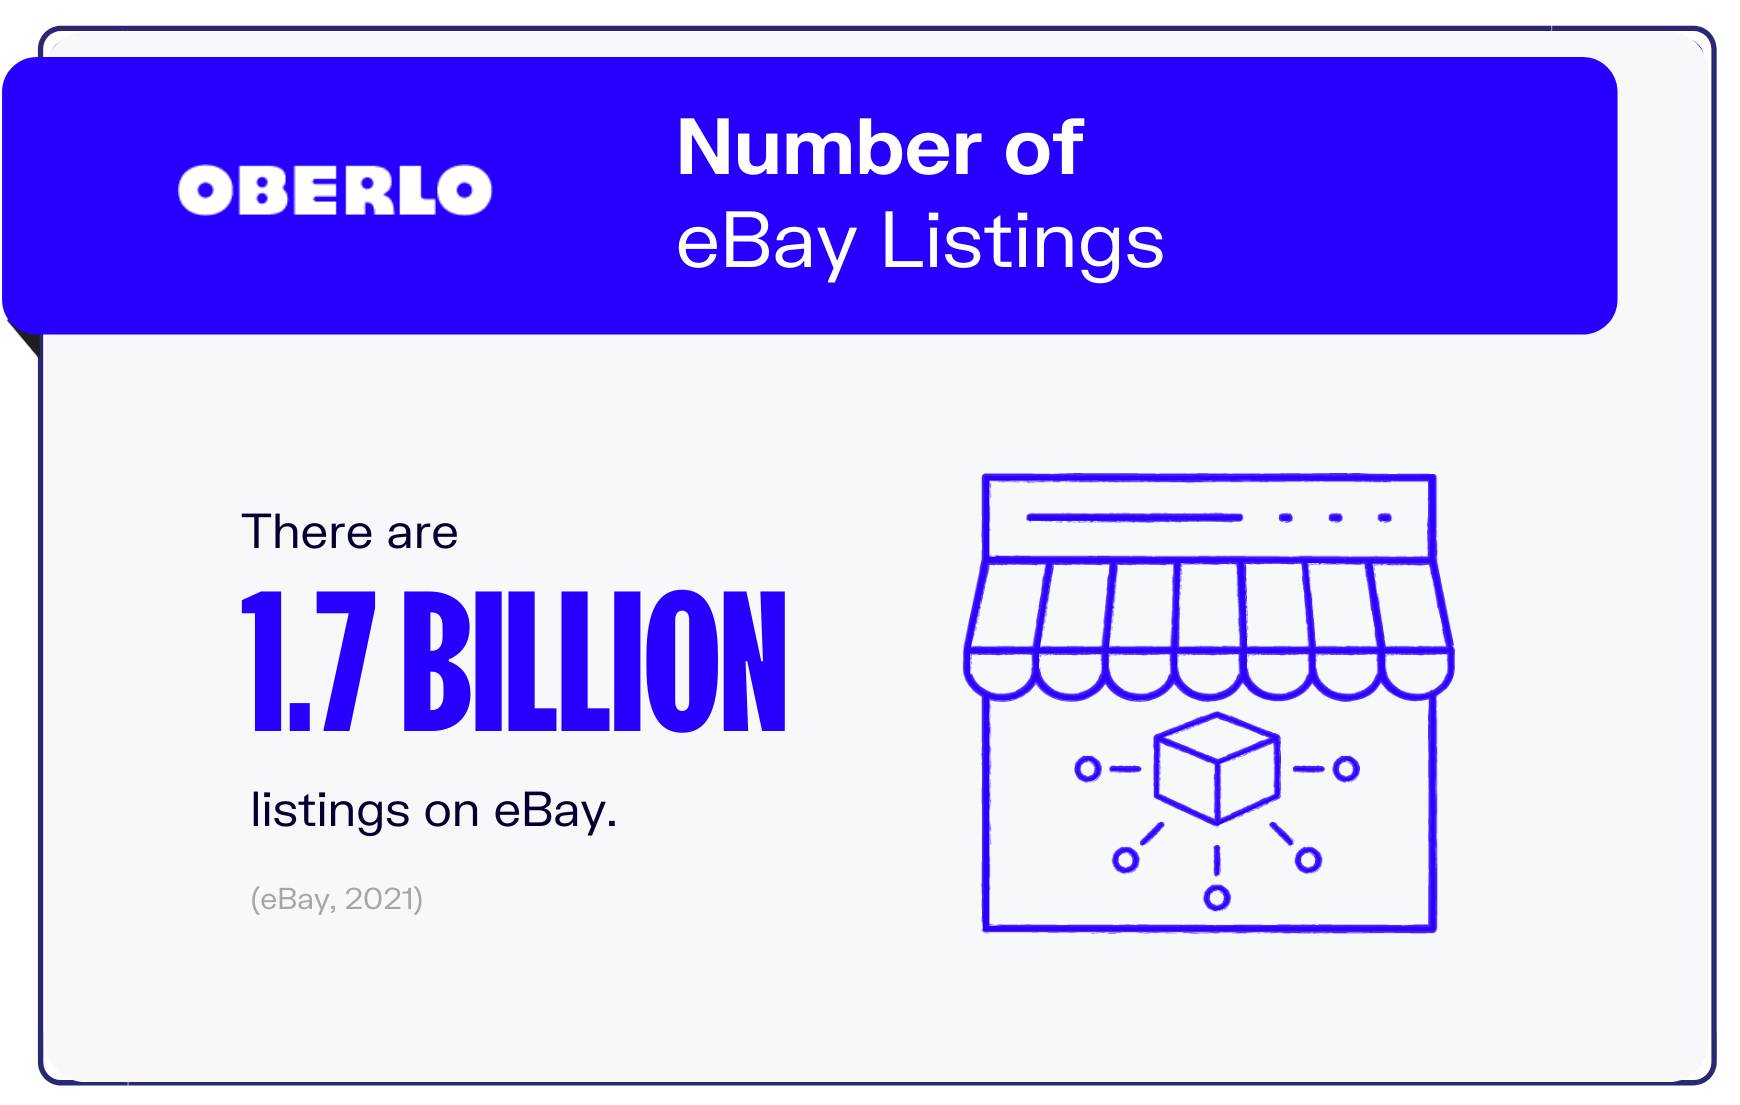 ebay statistics graphic 4